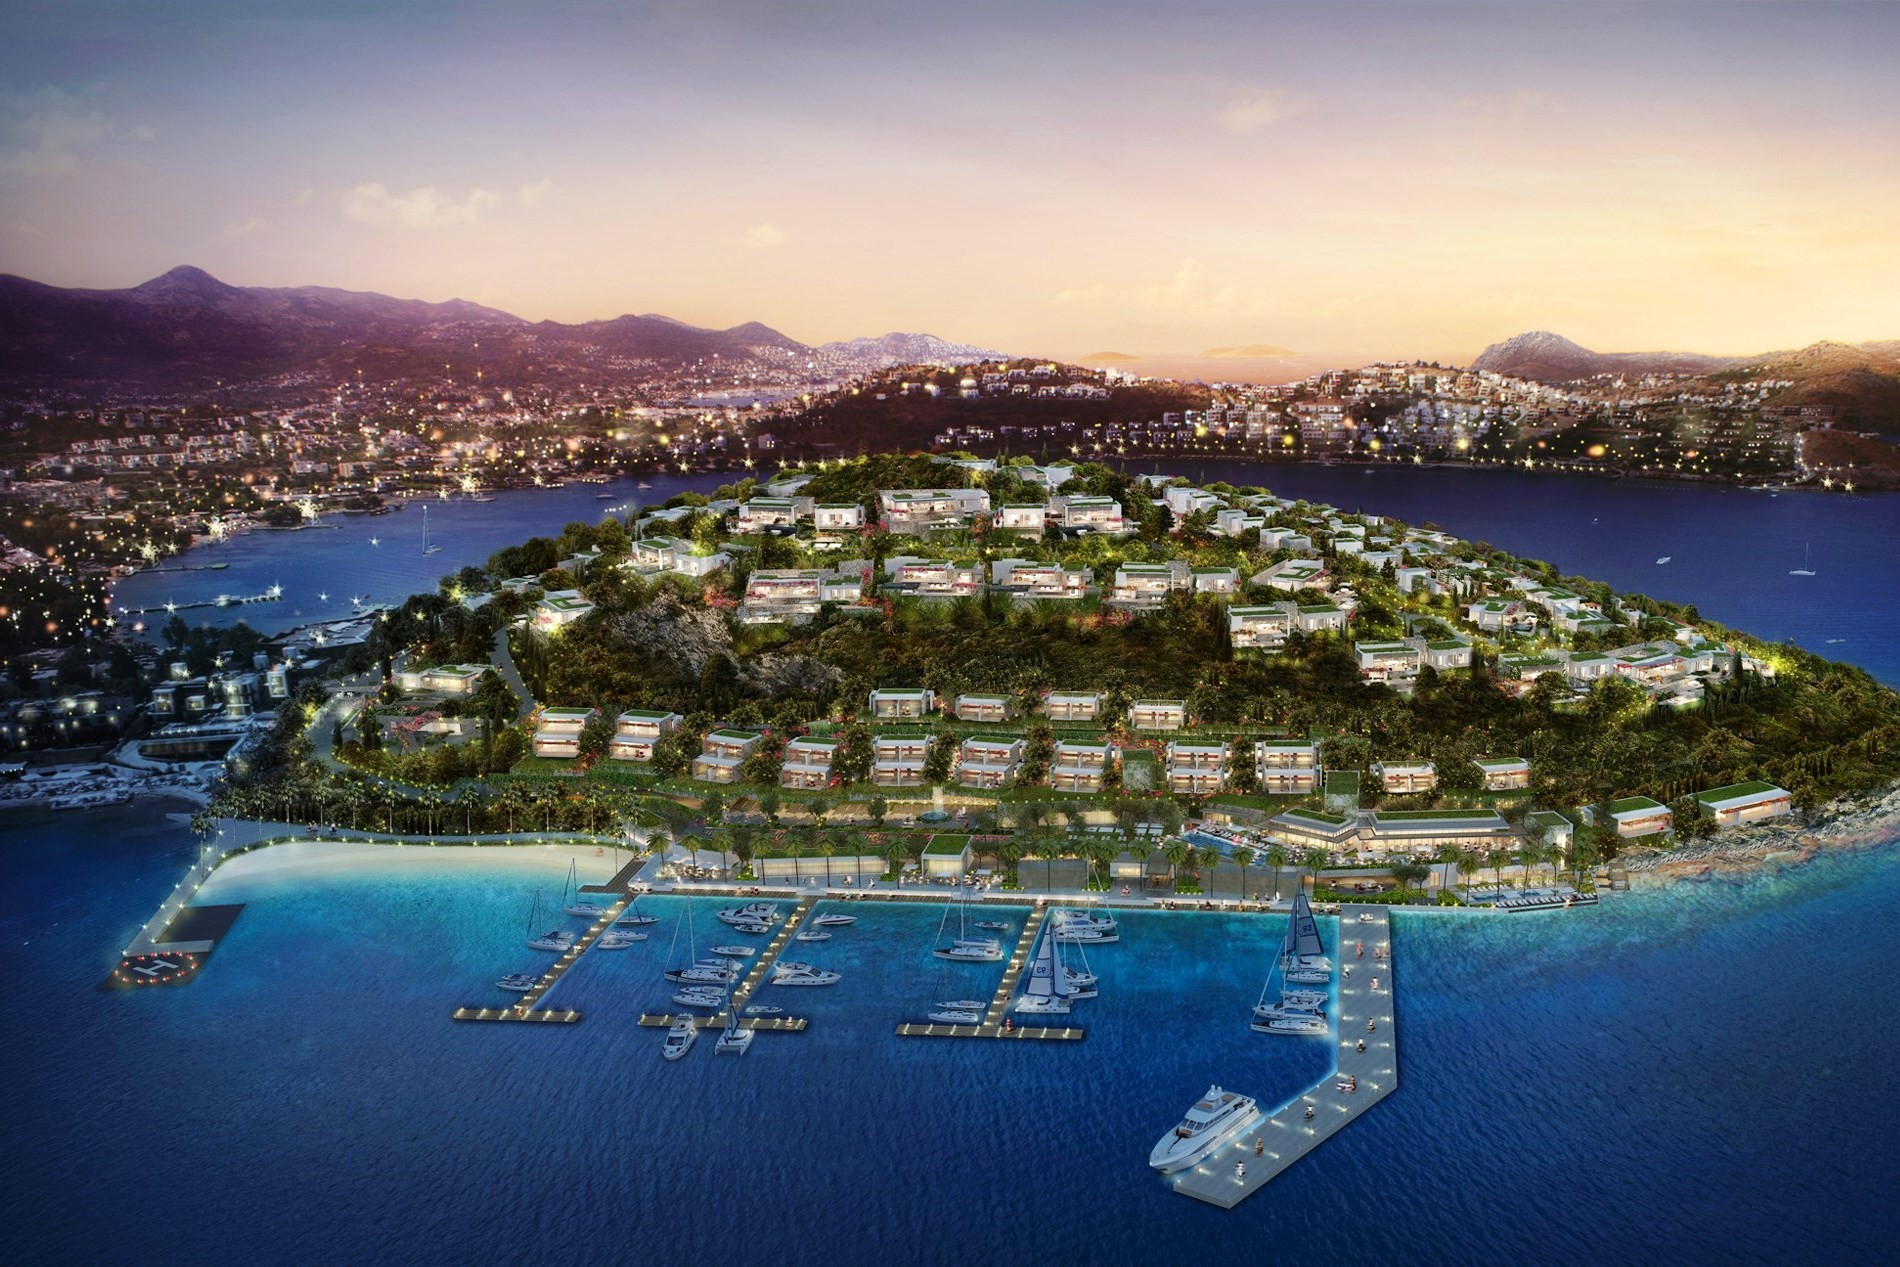 epique island EPİQUE ISLAND'IN İSKELESİ VE DOLGU ALANI İPTAL EDİLDİ… epique island